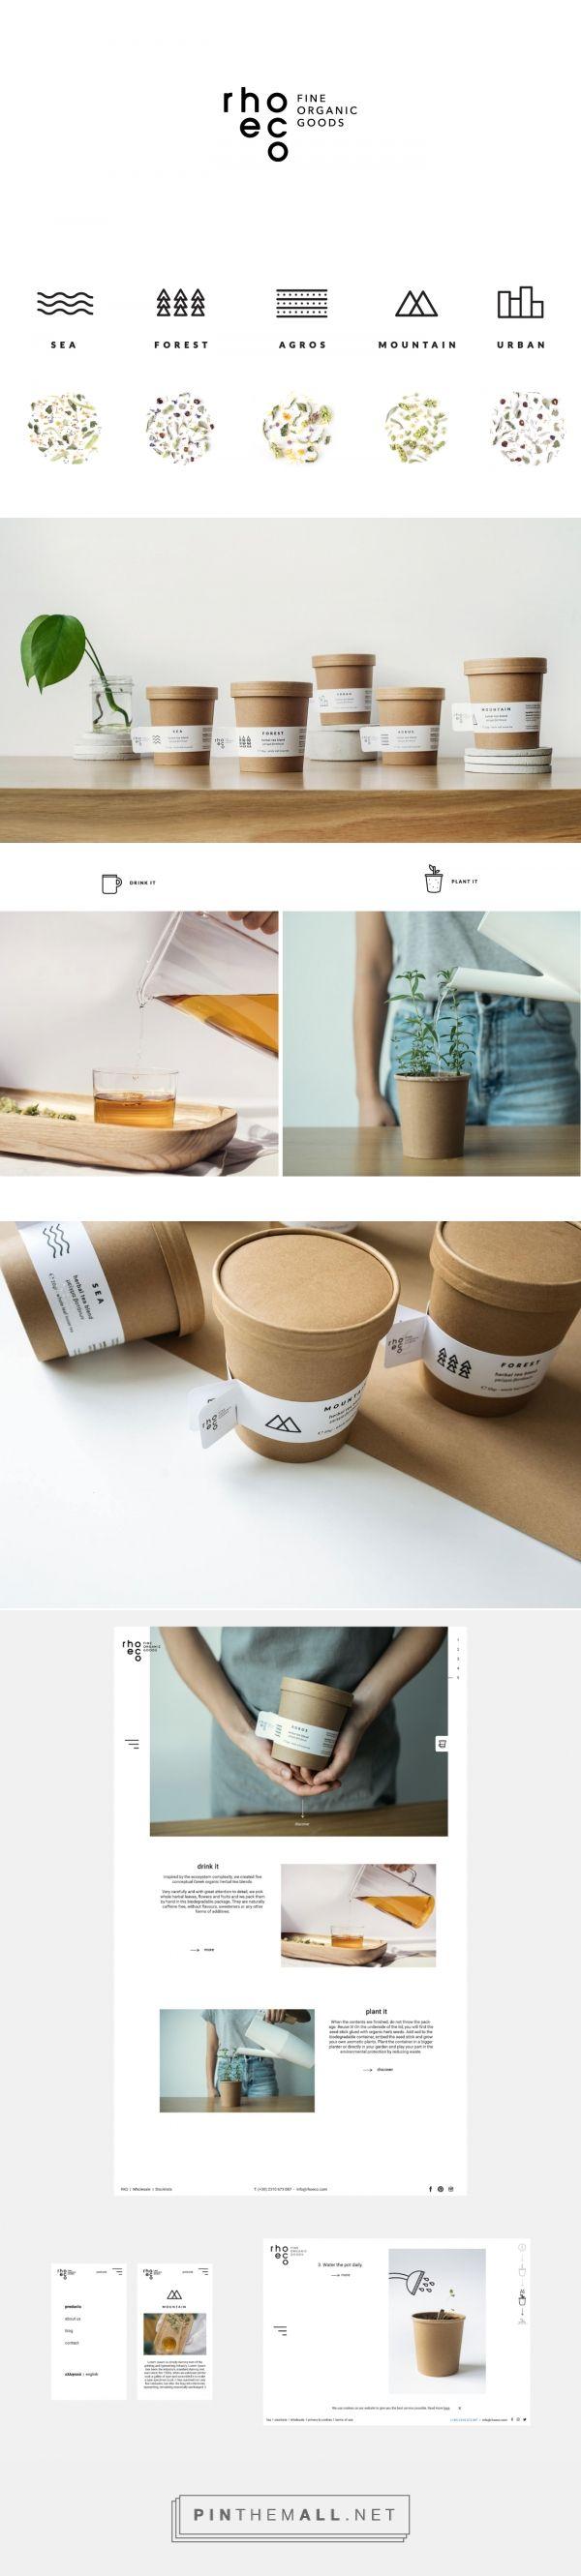 rhoeco sustainable tea packaging design by We design - http://www.packagingoftheworld.com/2017/01/rhoeco.html